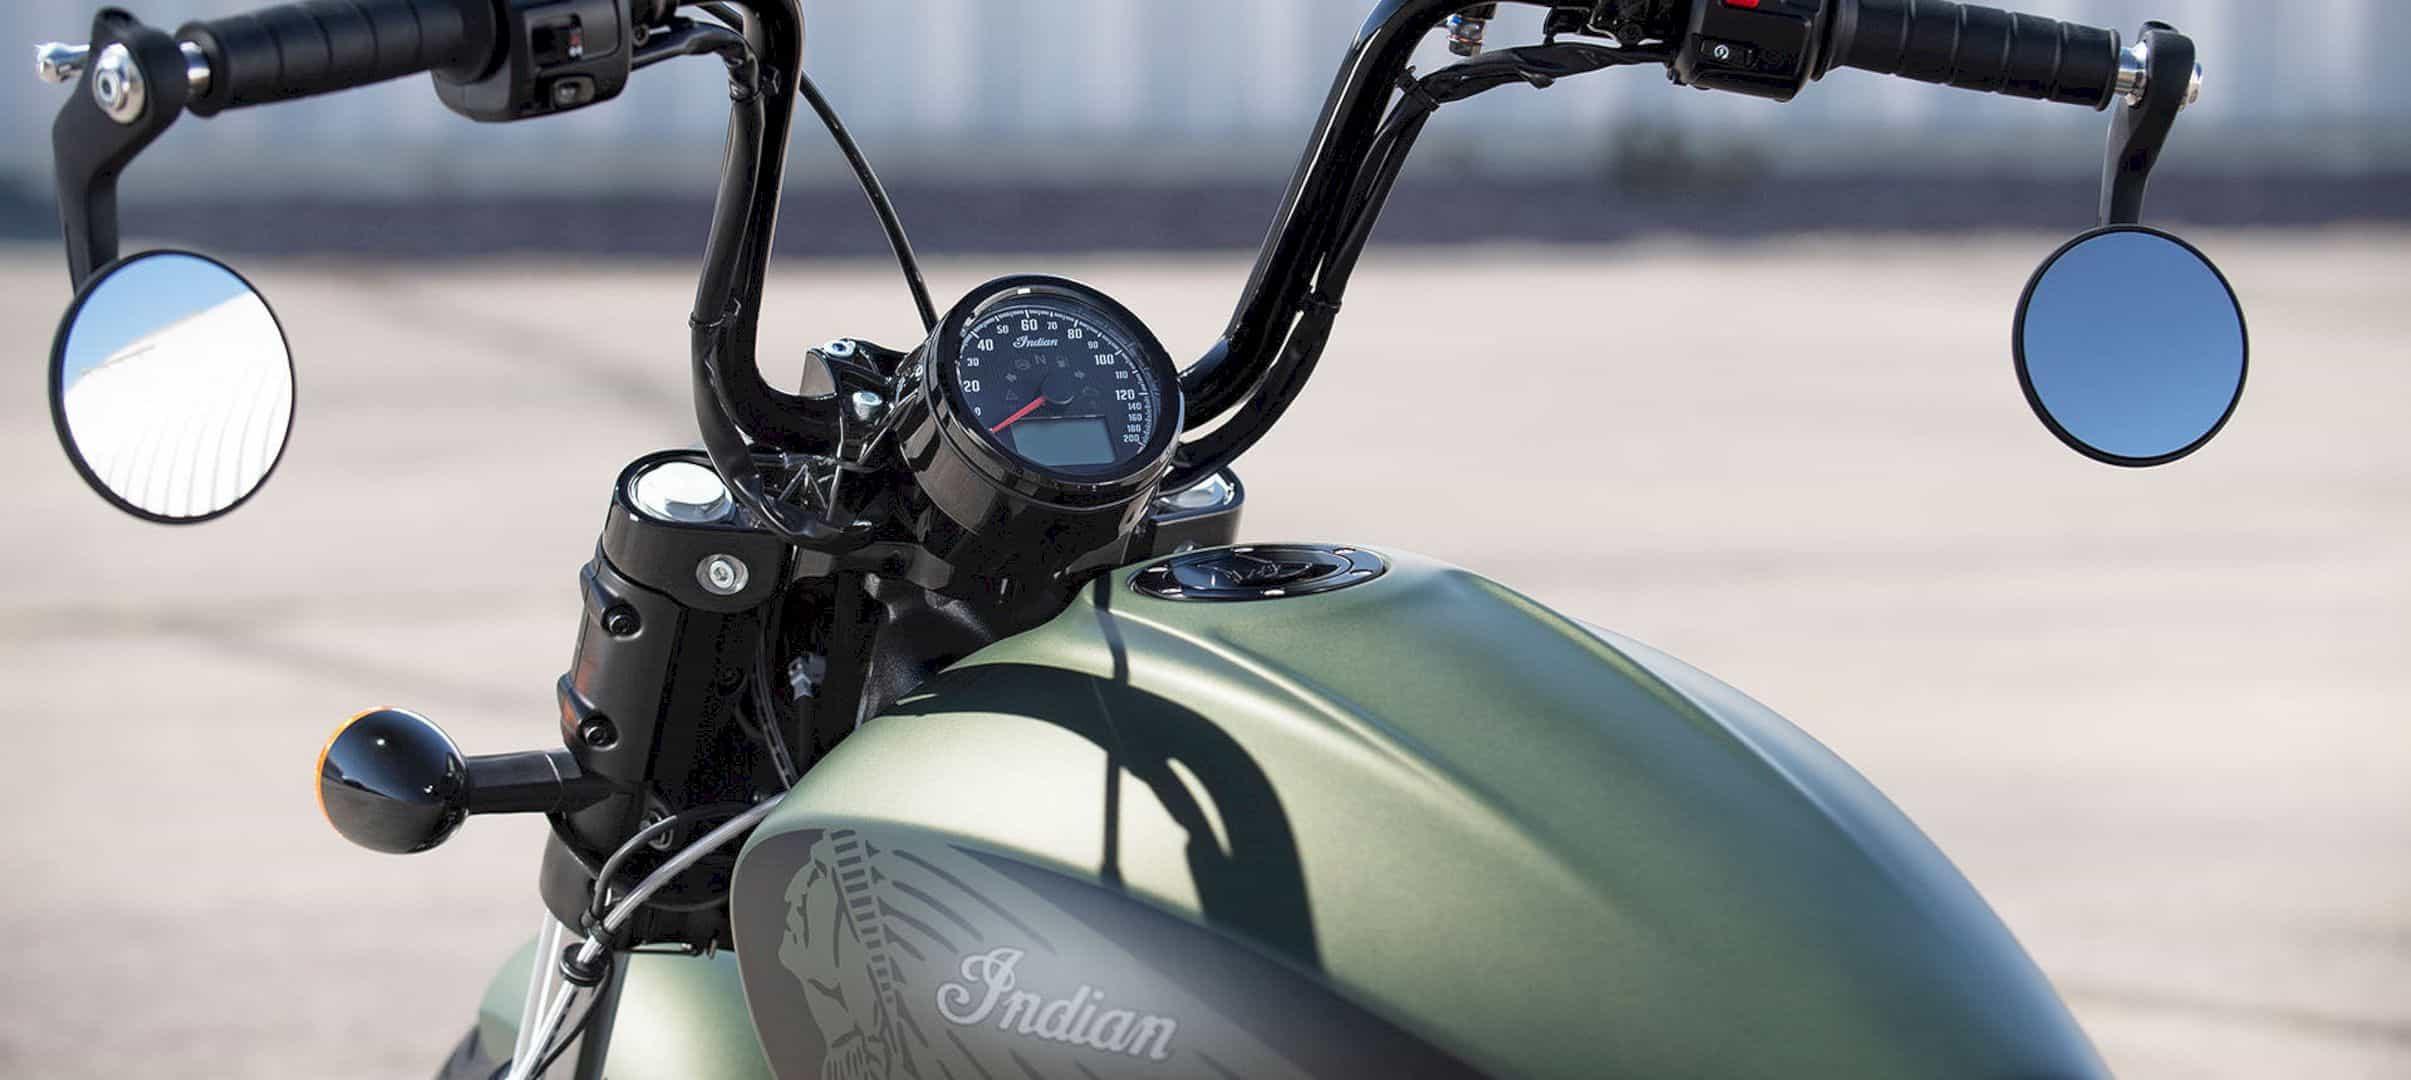 Indian Scout Bobber Twenty Motorcycle 6